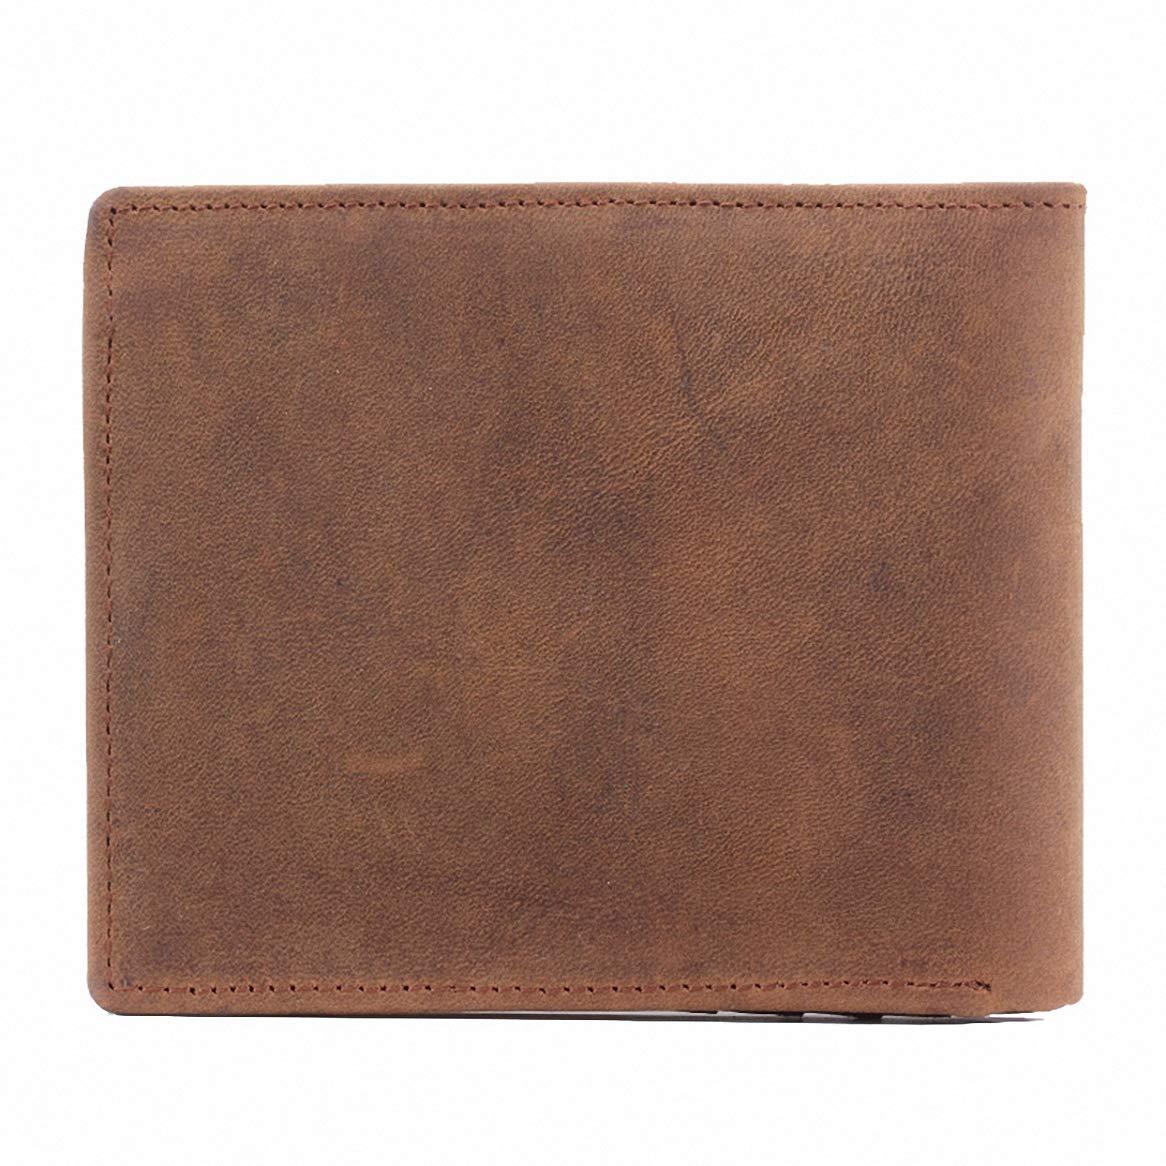 Mens Short Wallets Card Slot Folding Fashion Money Clip Brown